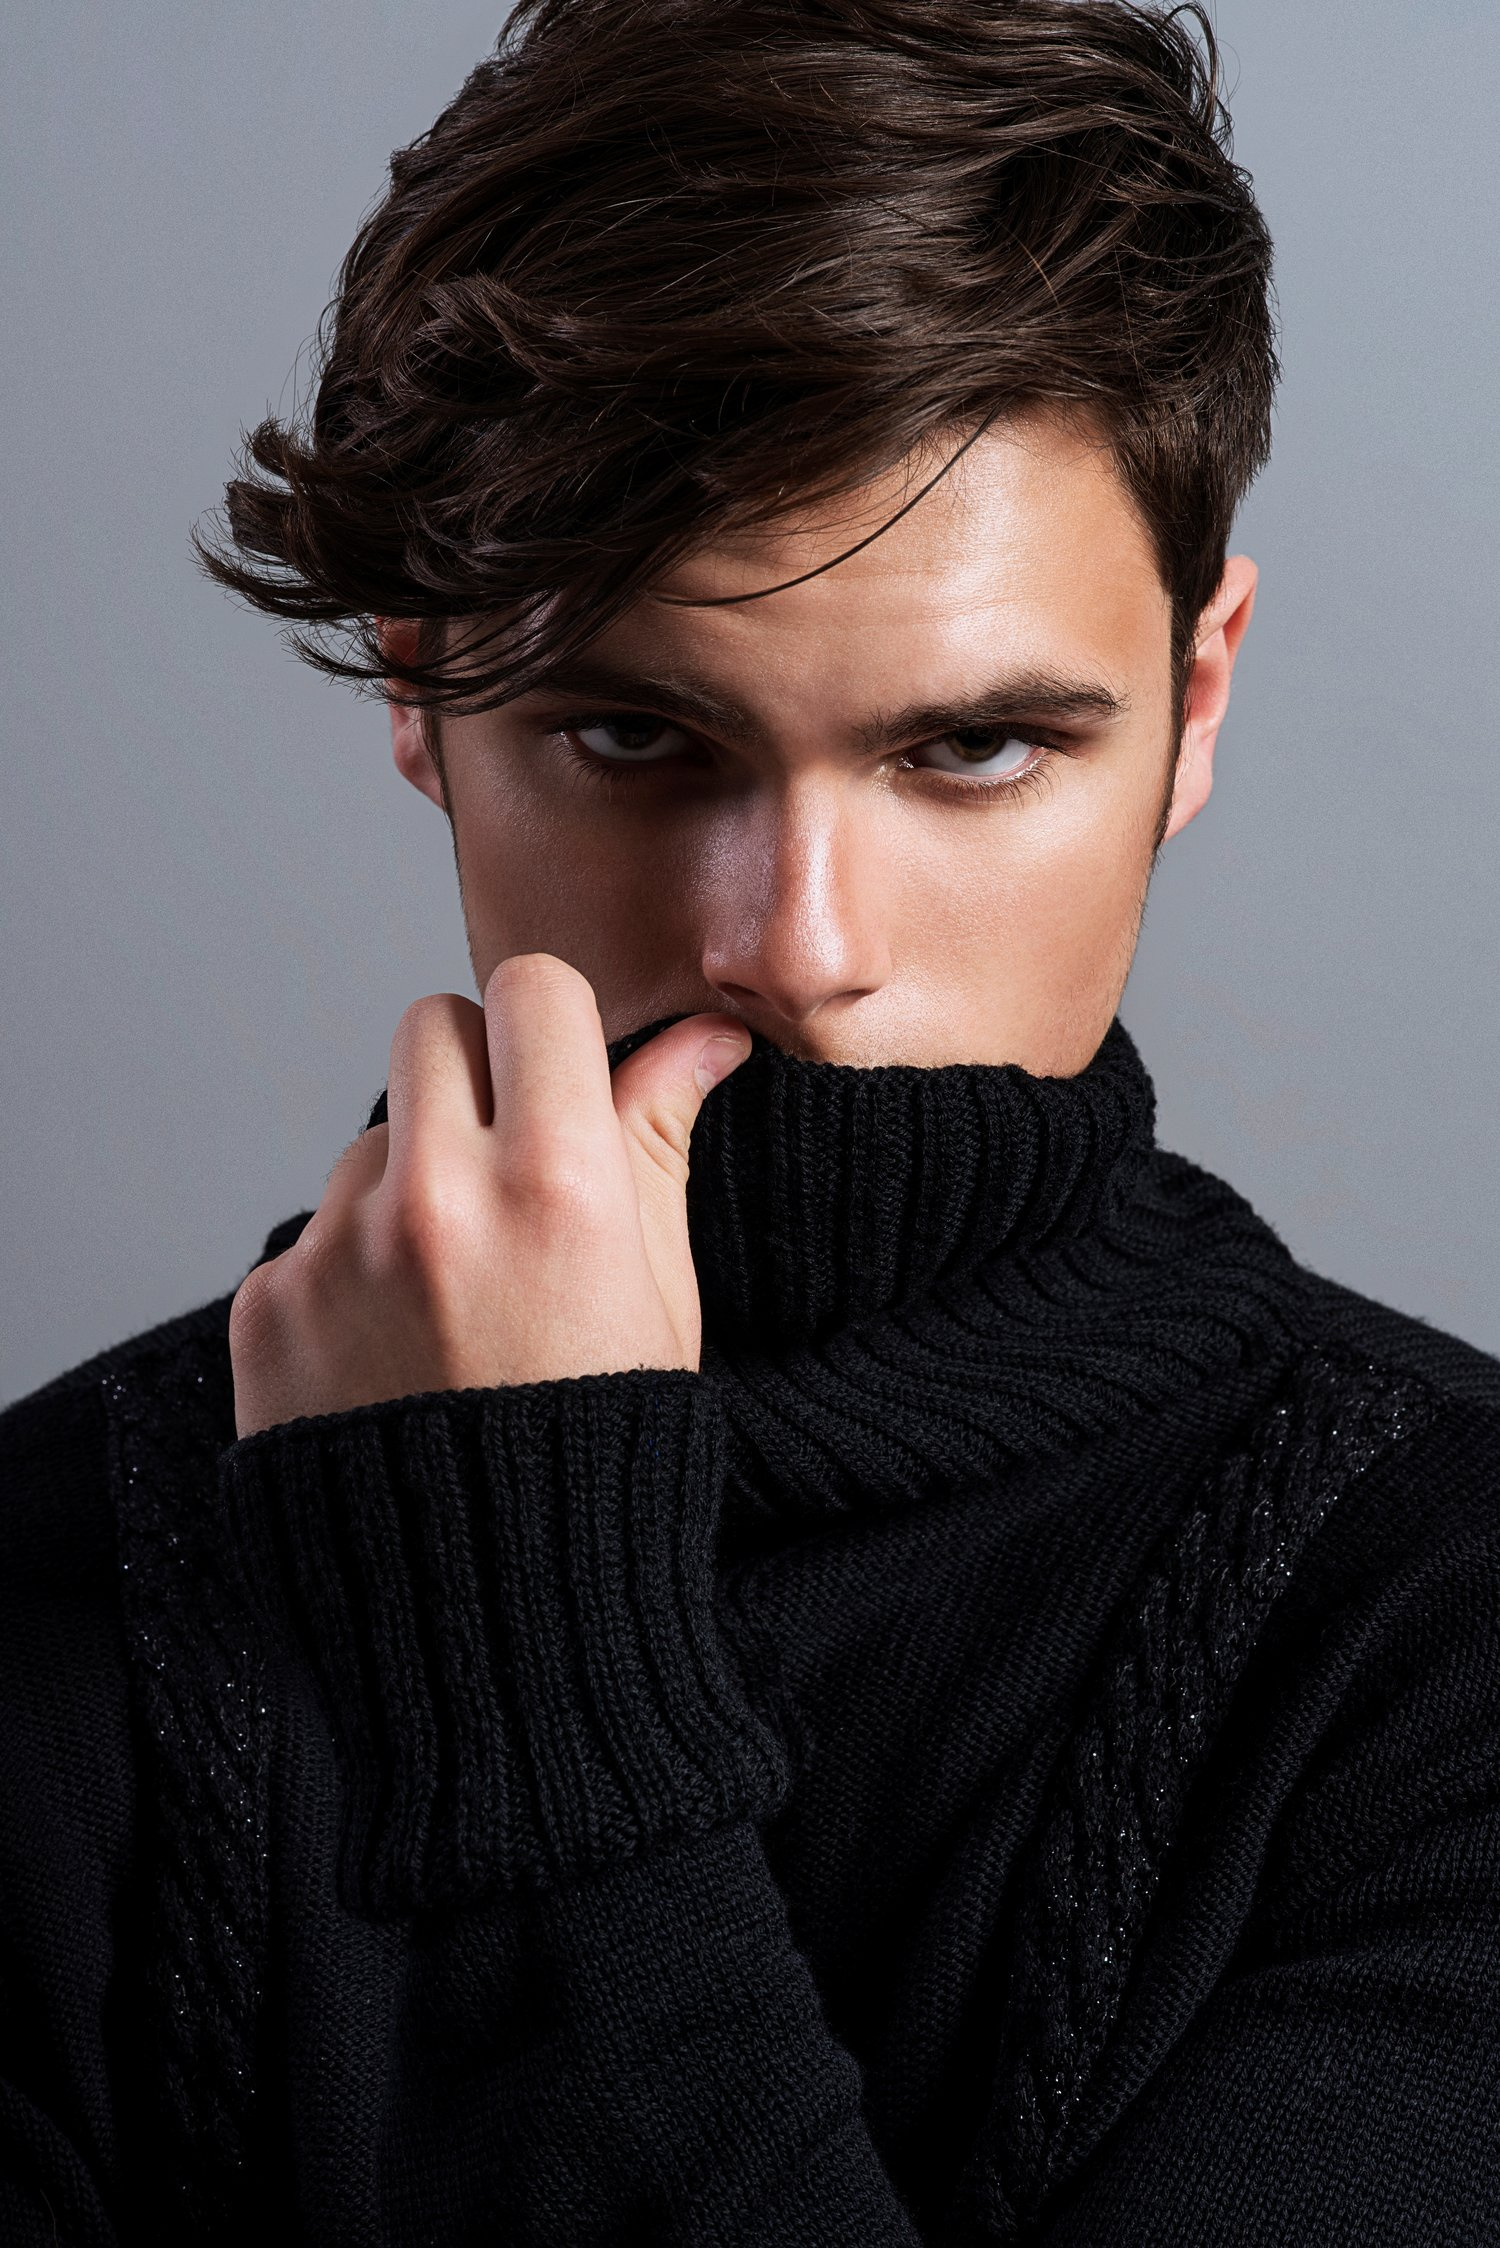 Adon Exclusive: Model Casey Jackson By Gregory Keith Metcalf